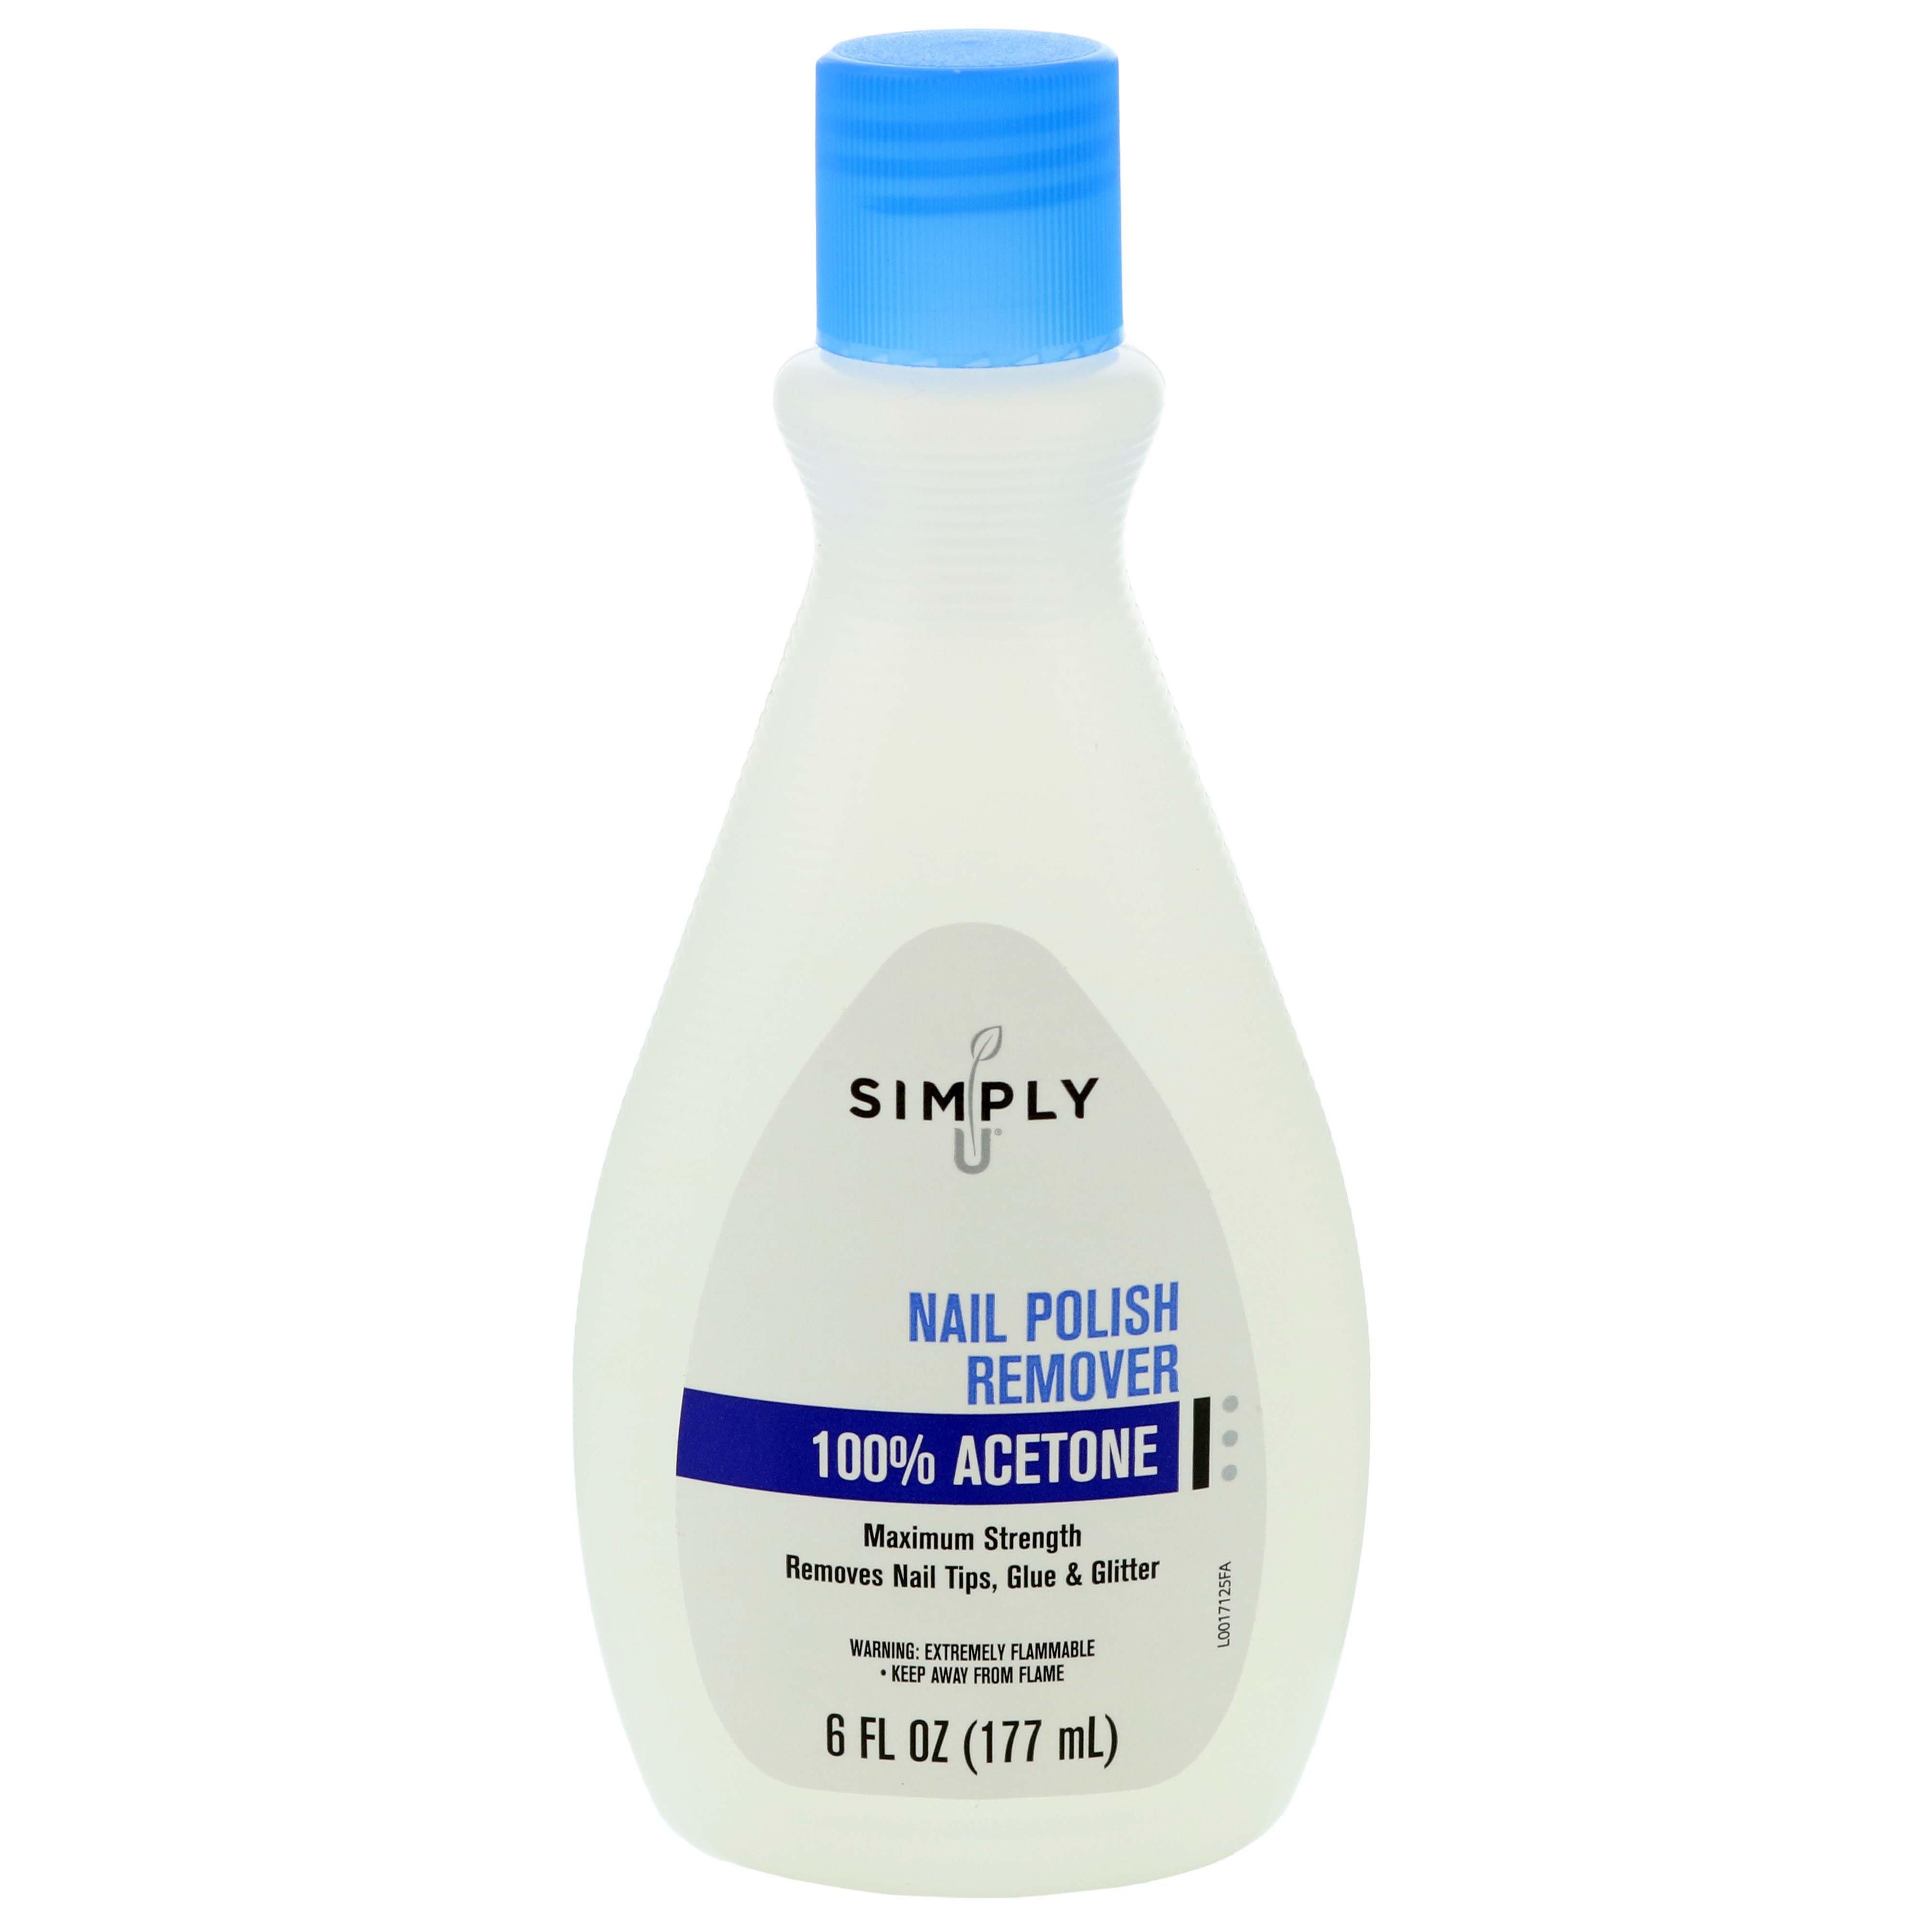 Simply U 100 Acetone Nail Polish Remover Shop Polish Remover At H E B